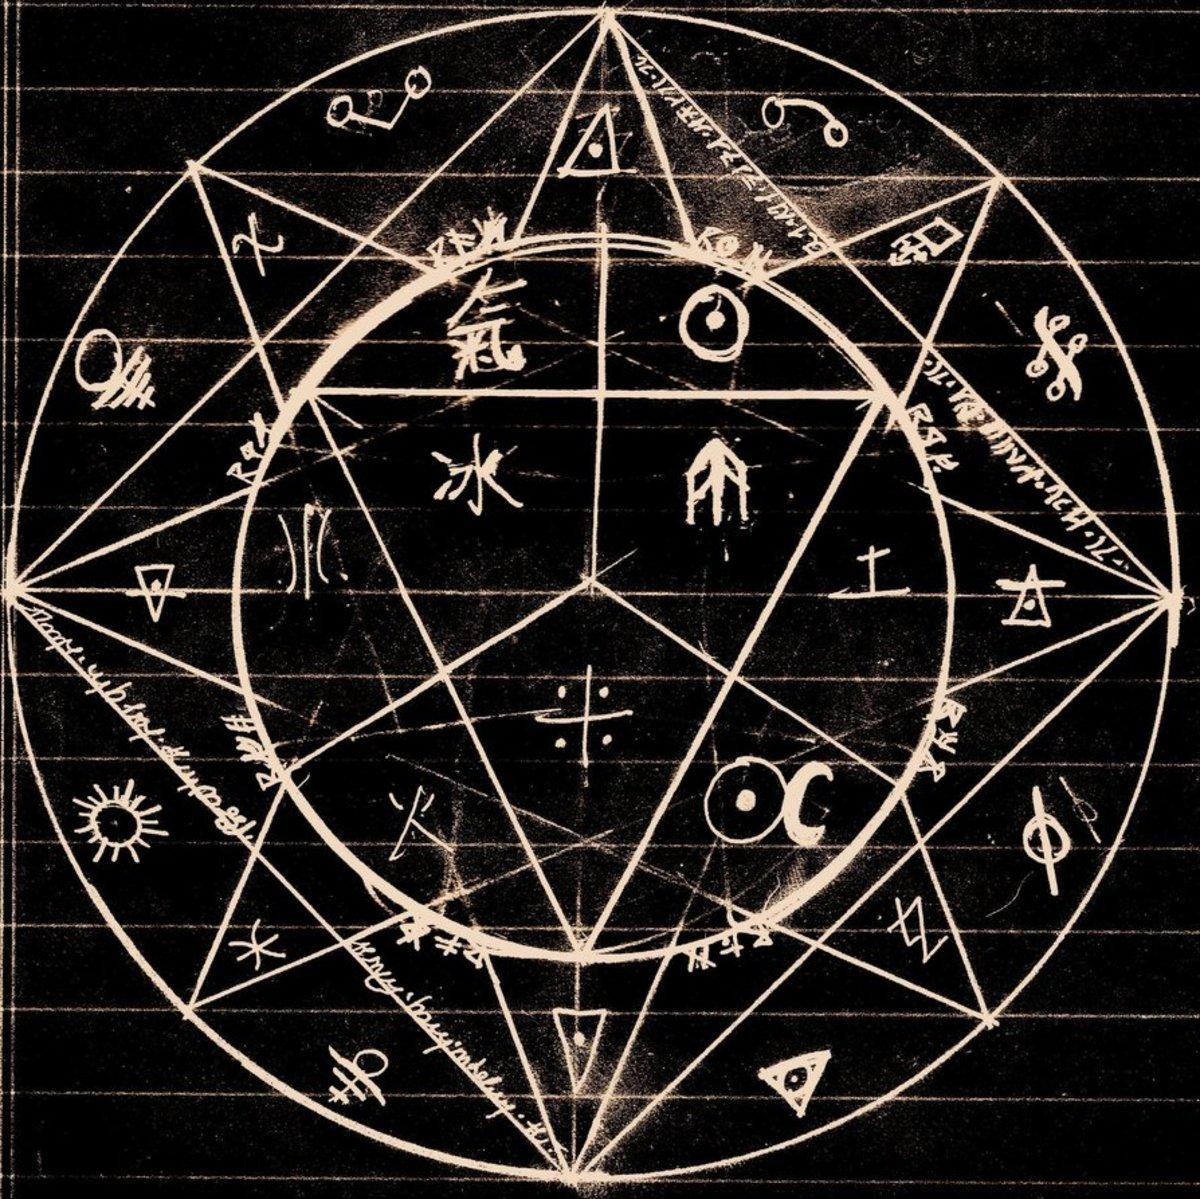 The Alchemy Circle